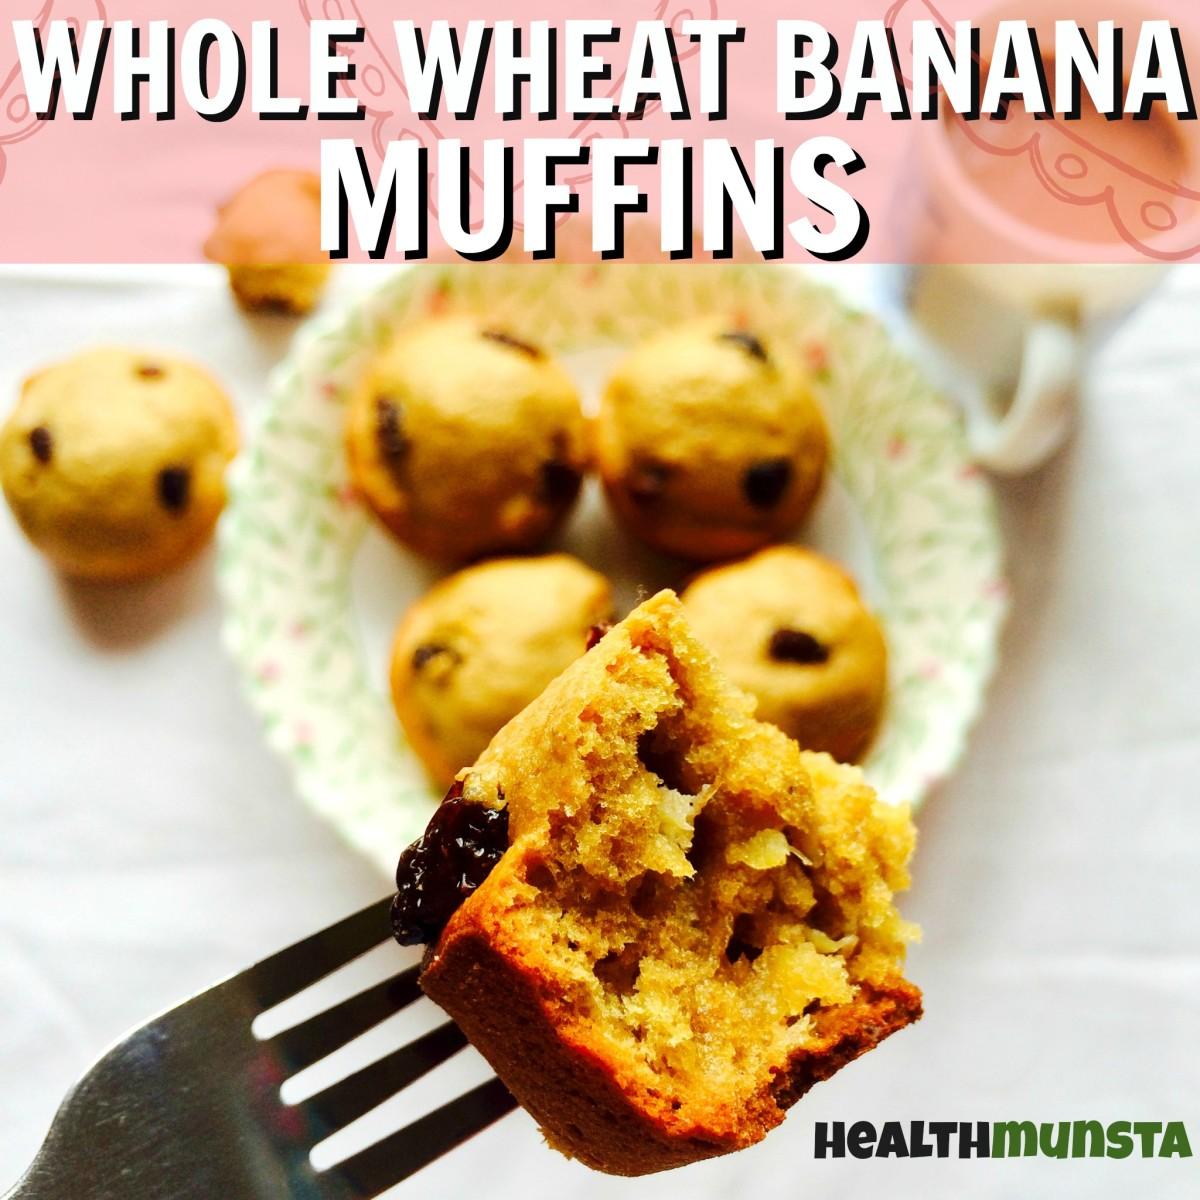 Easy & Healthy Whole Wheat Banana Muffin Recipe